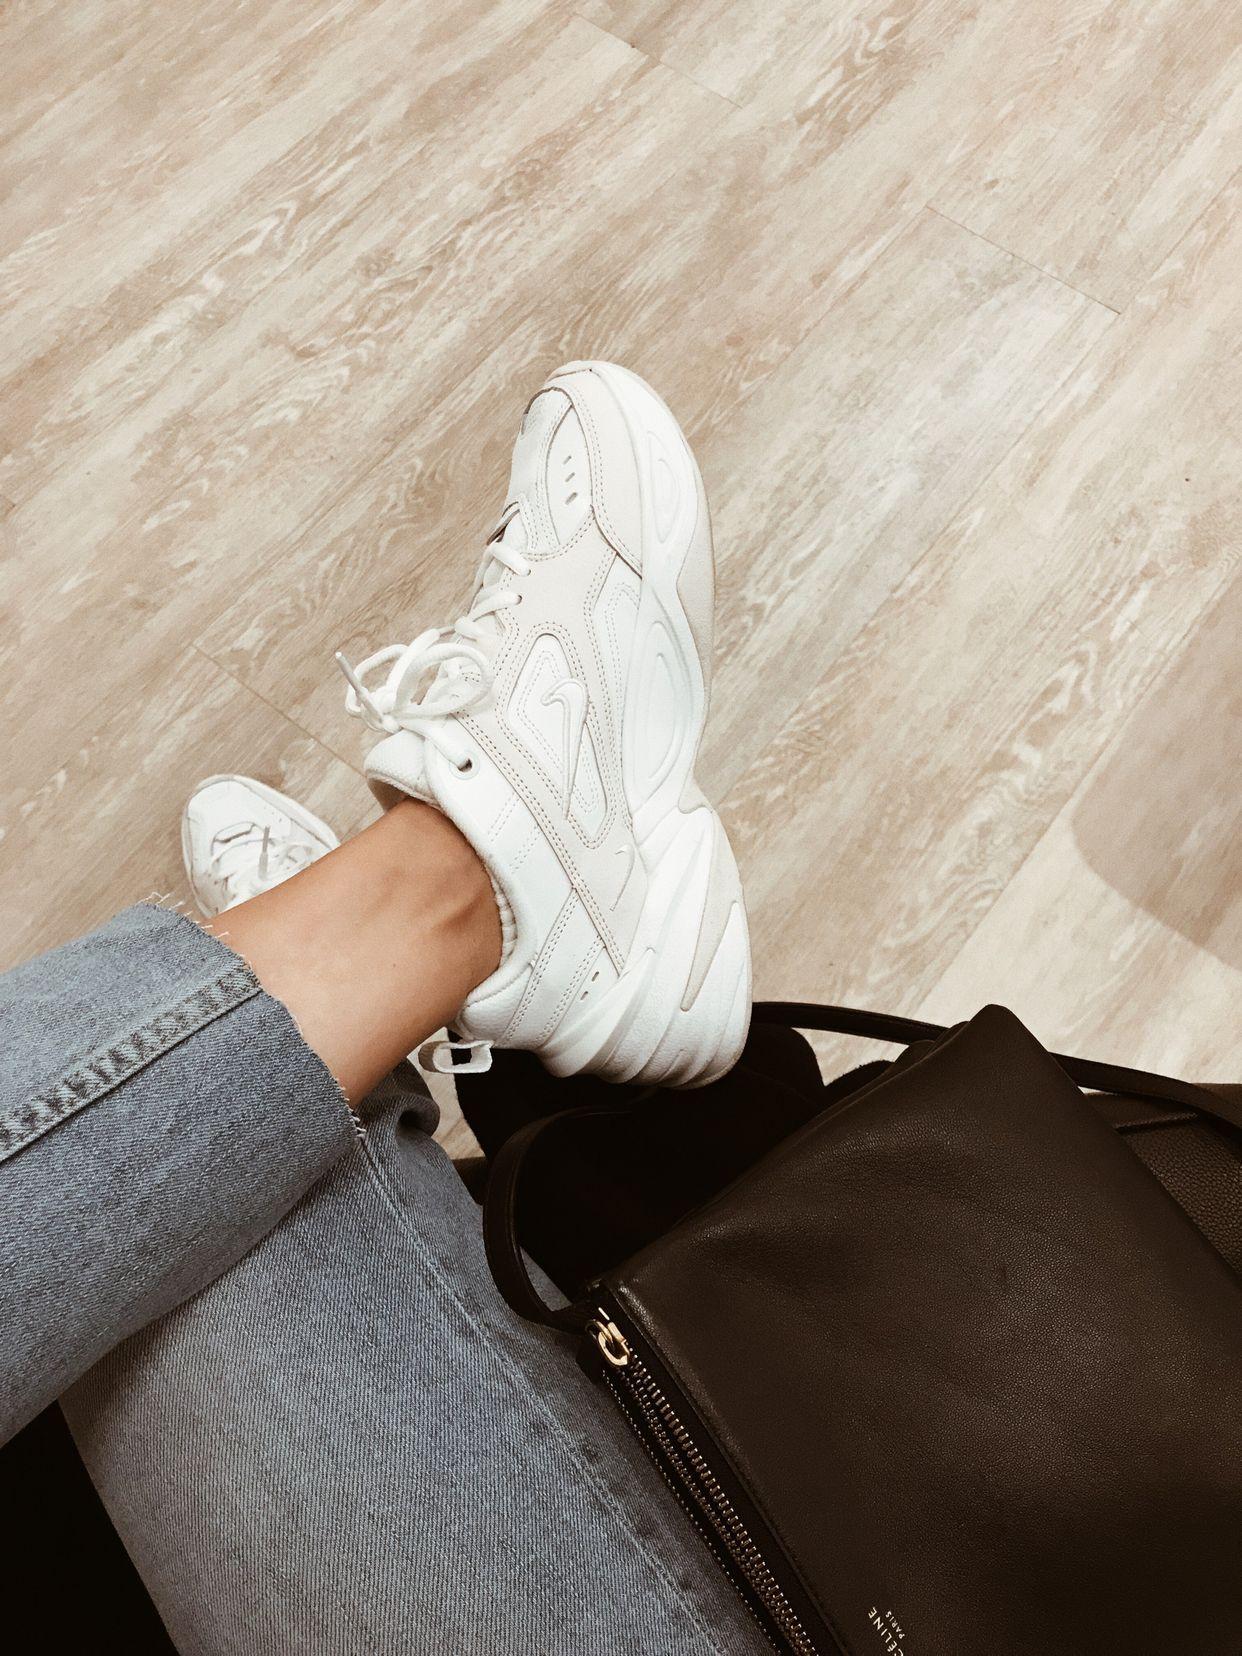 Nike M2K Tekno (Moa Westerberg) | Fashion, Sneakers, Dad shoes